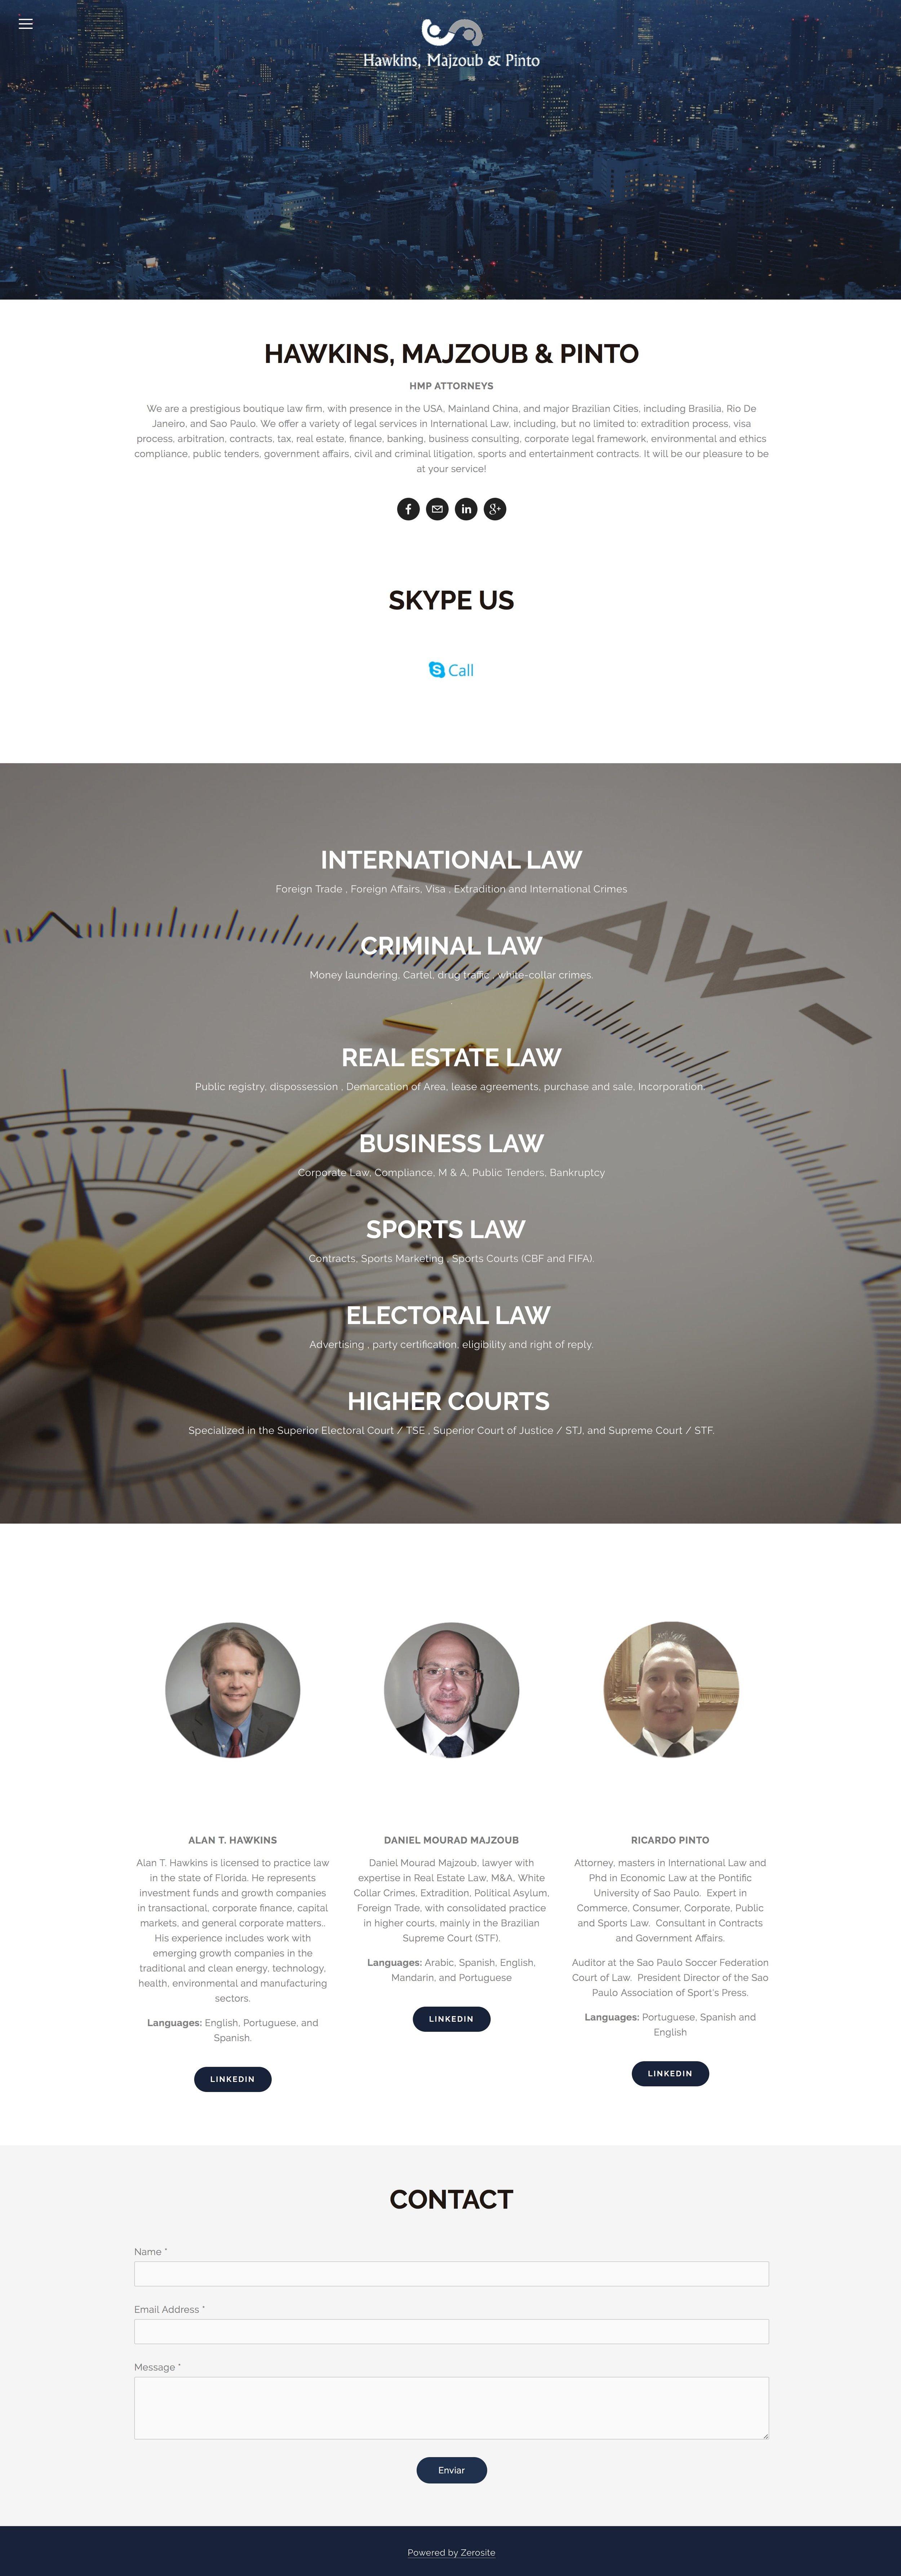 cliente da agencia zerosite HMP advogados